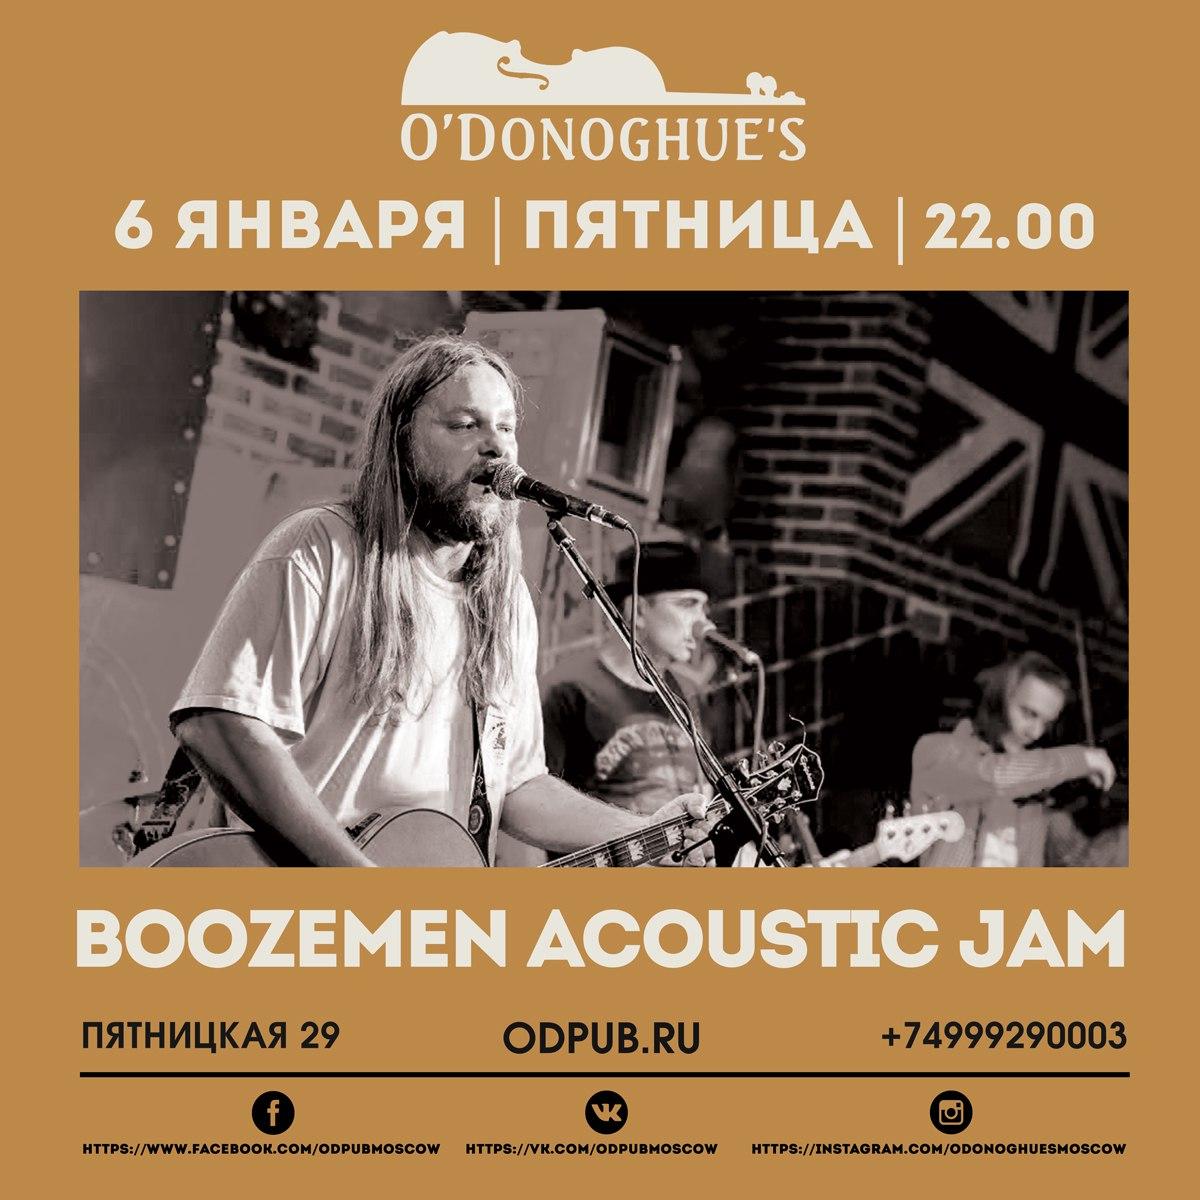 06.01 Boozemen Acoustic jam в O'Donoghue's pub